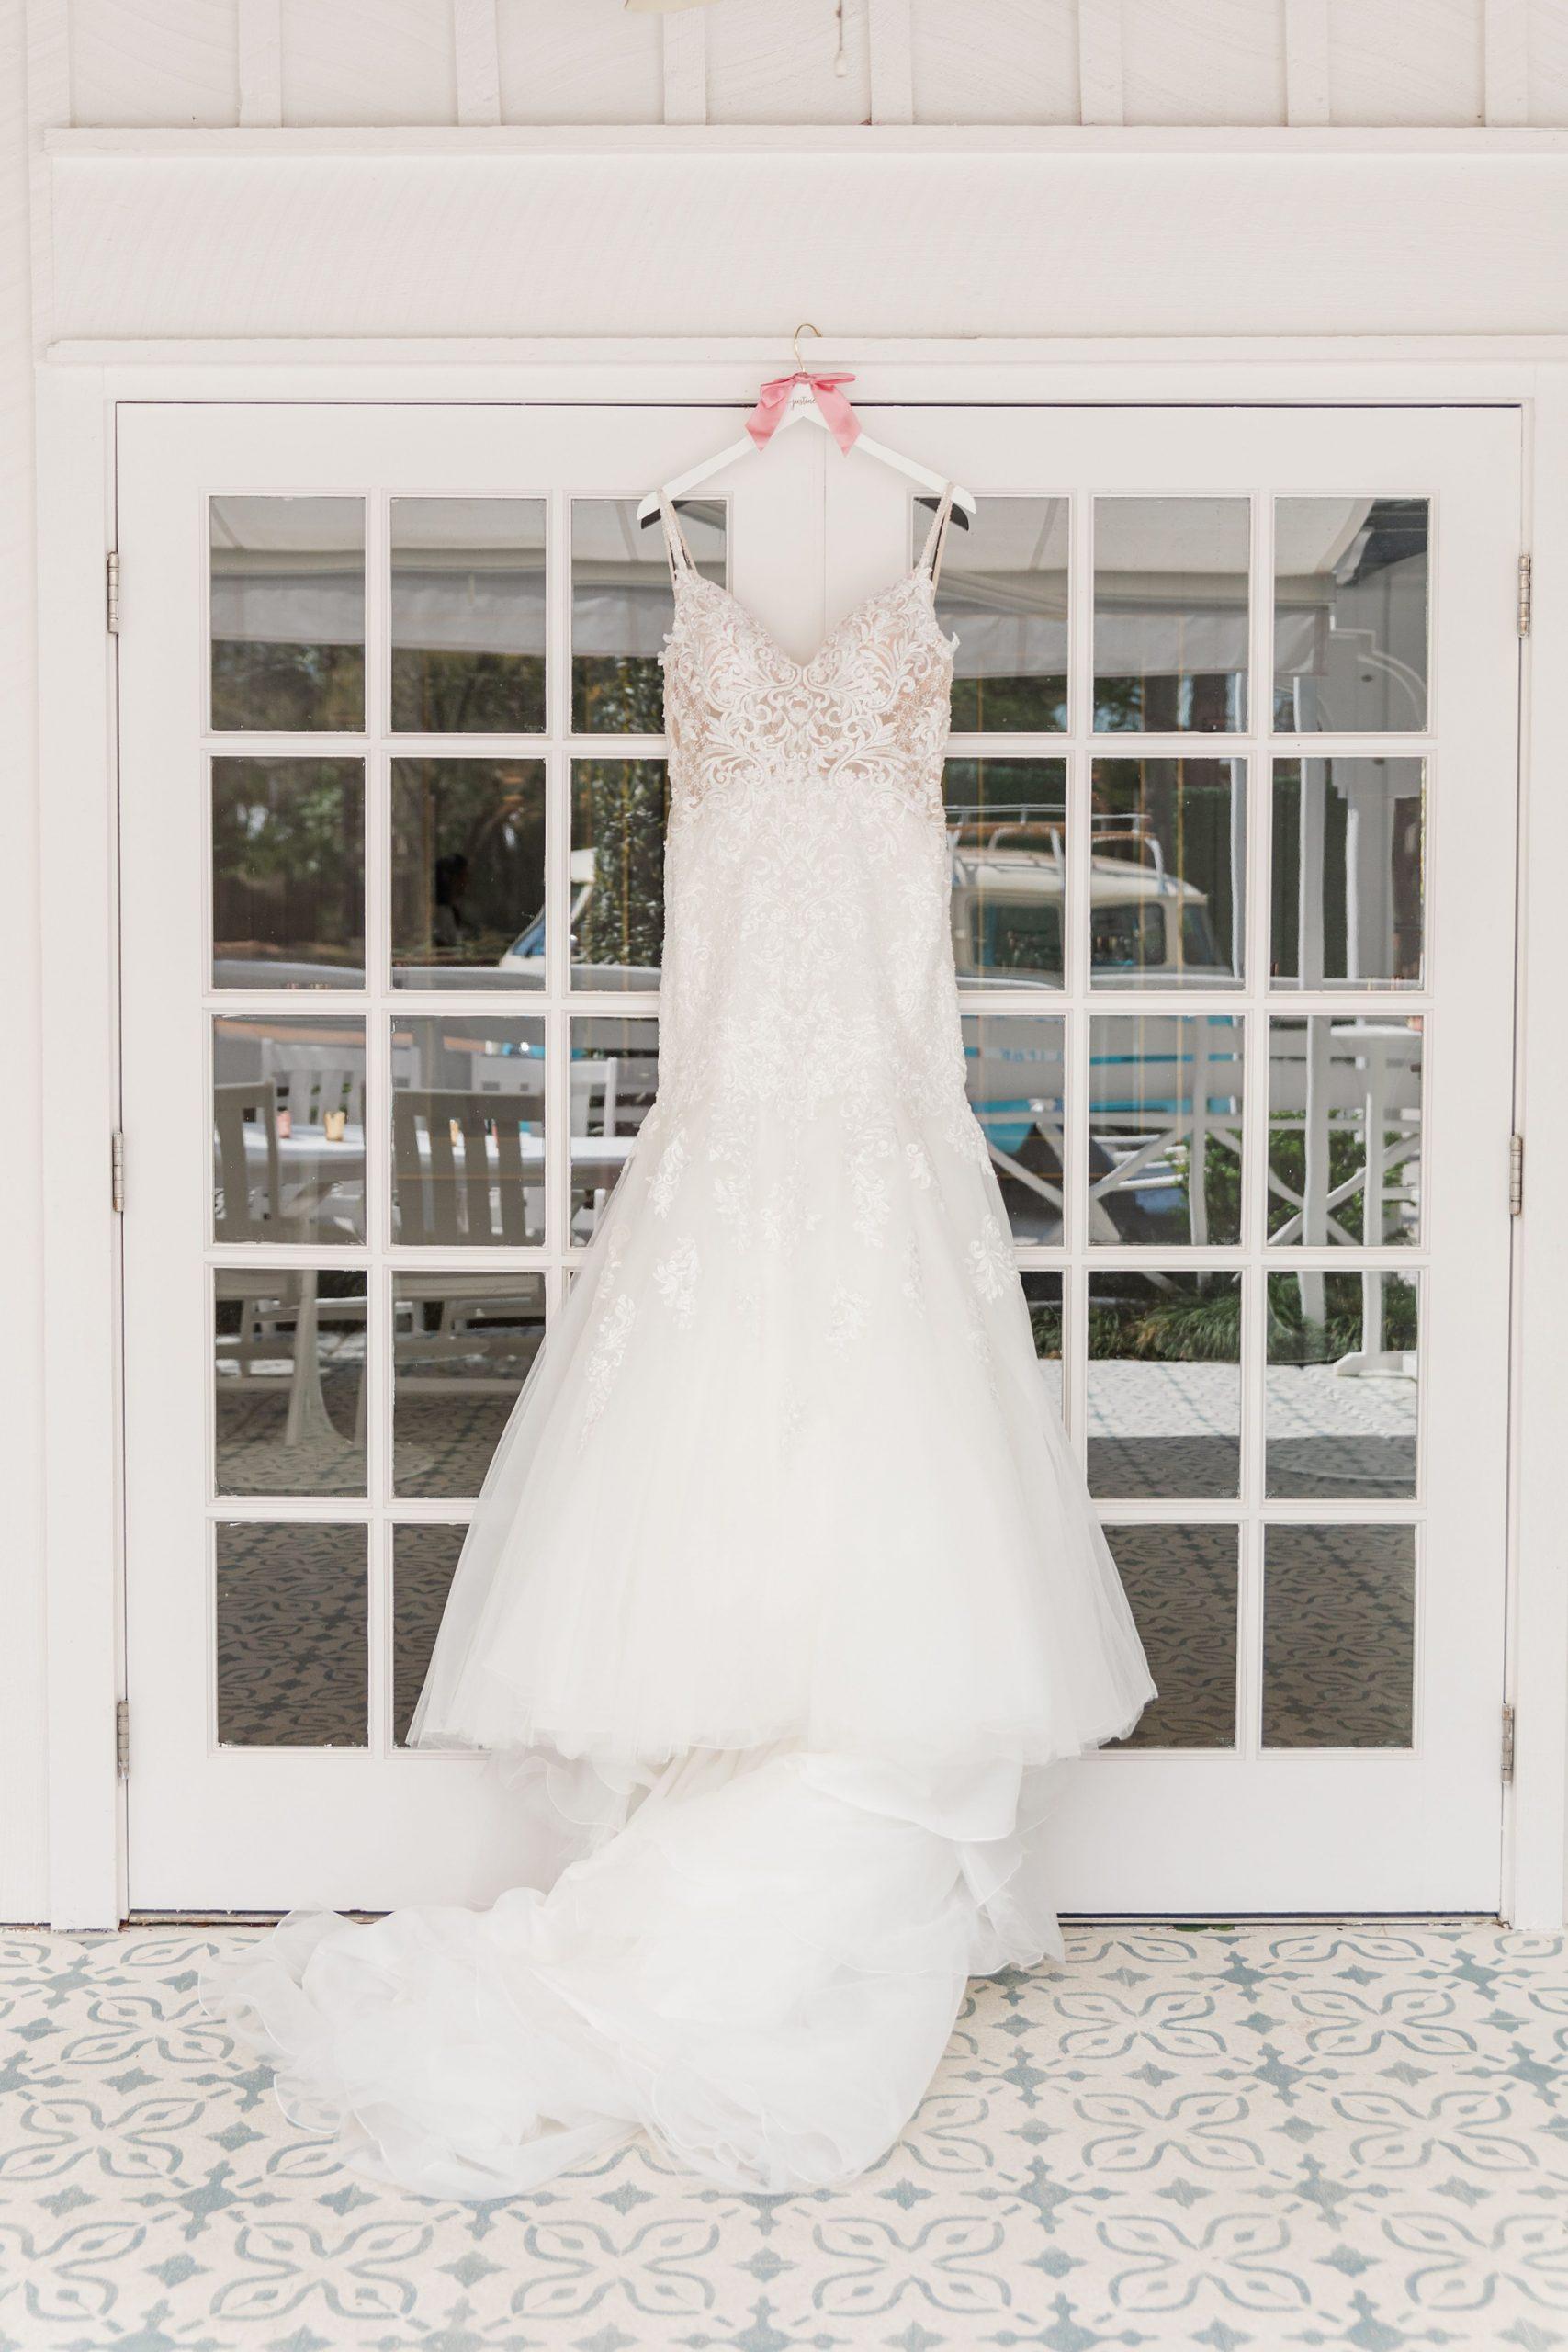 wedding dress hangs at The Grand Hotel